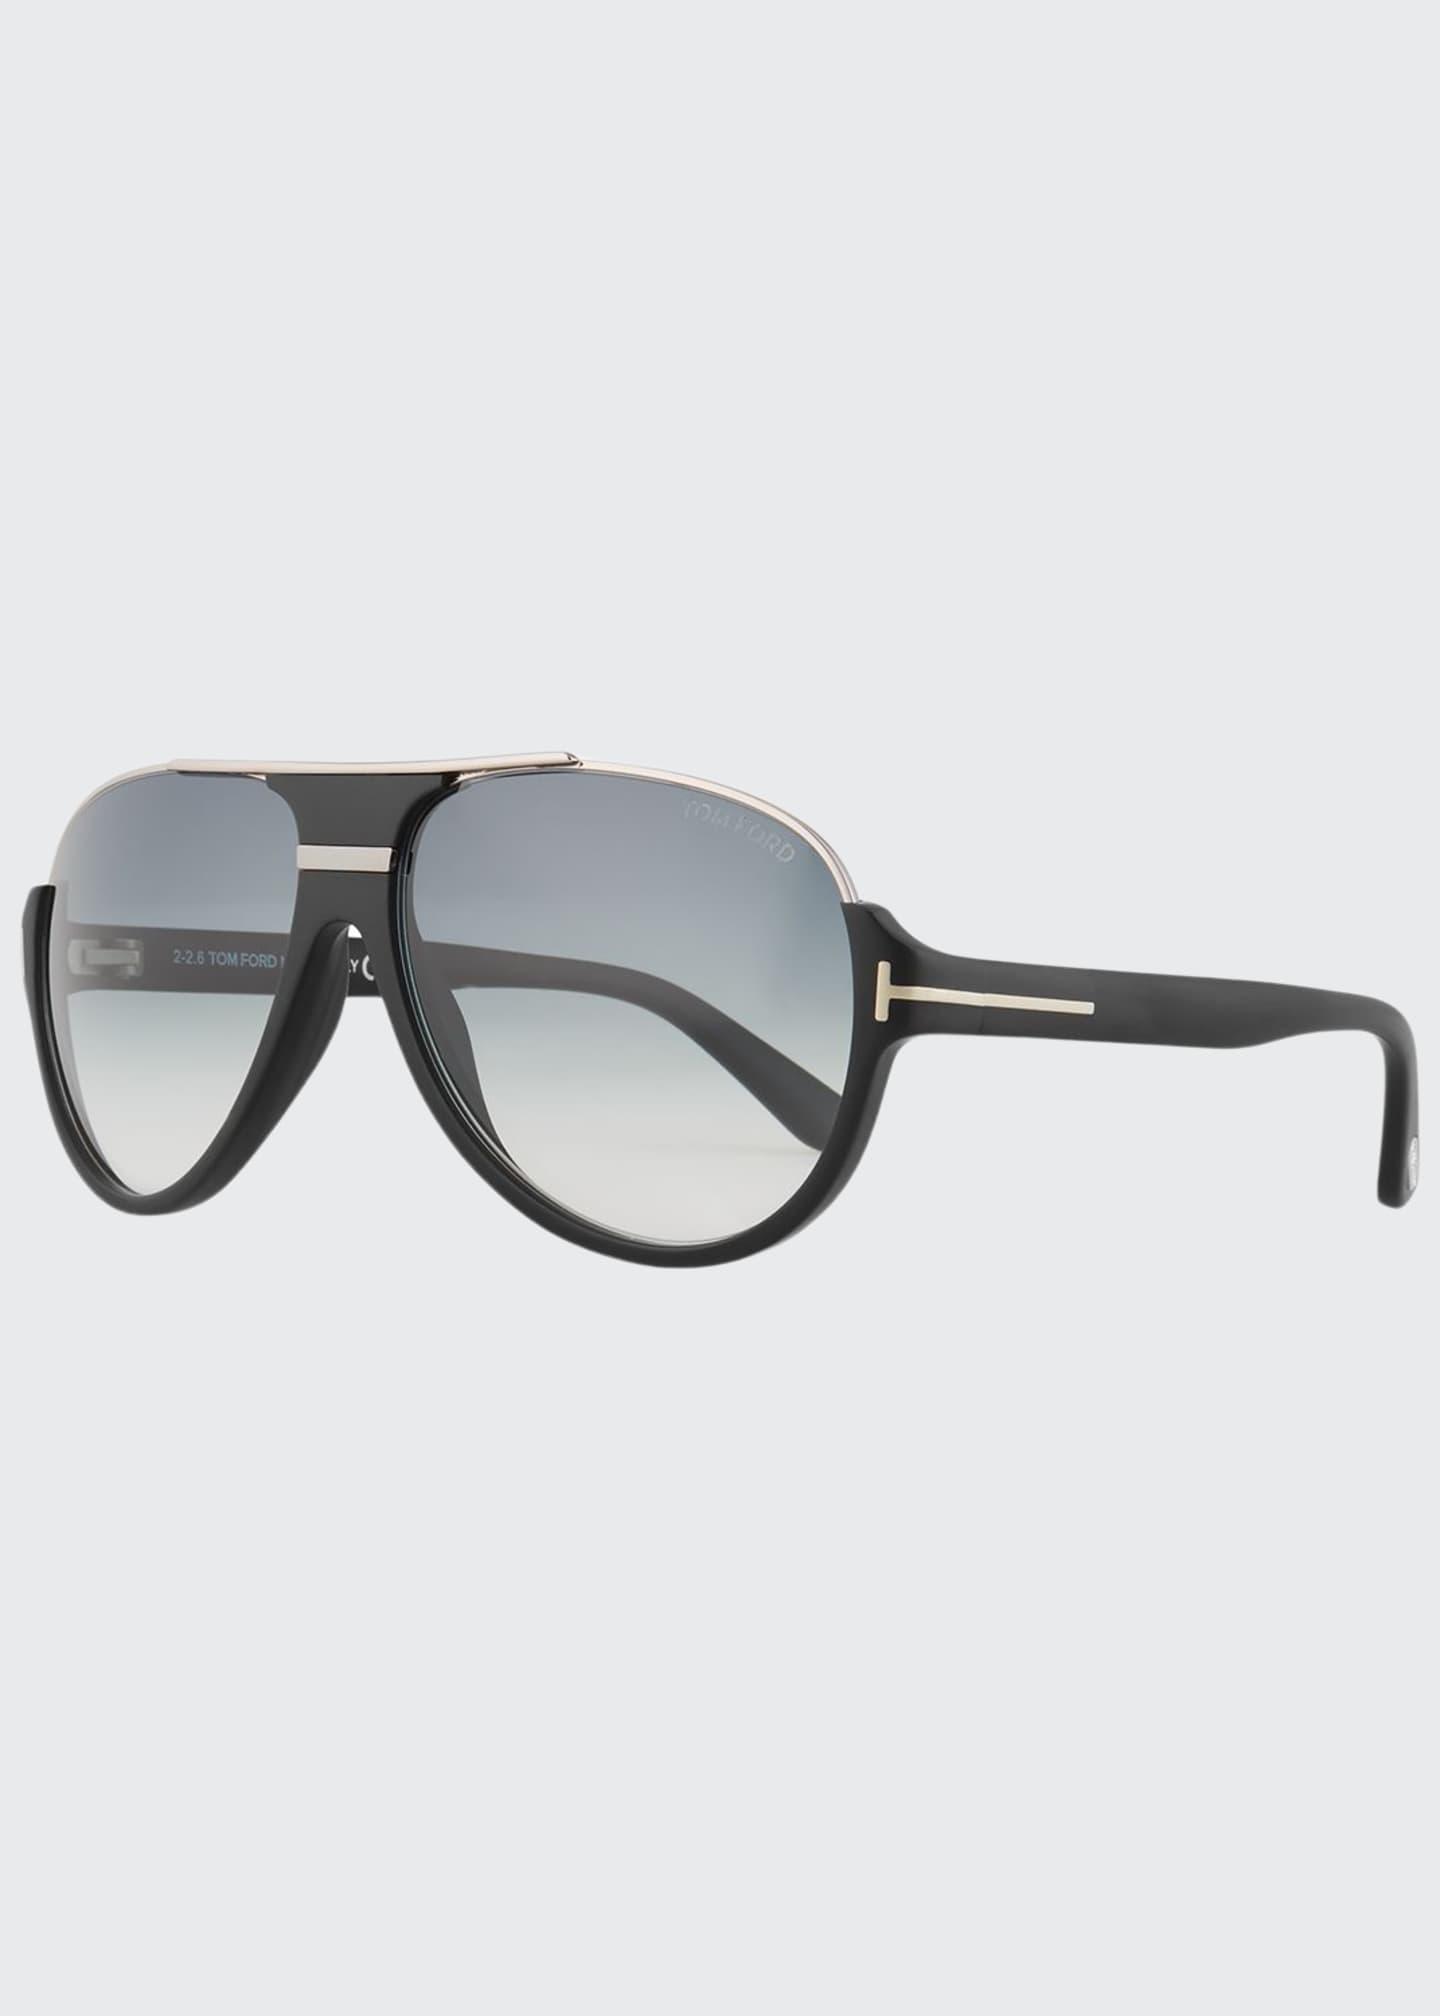 TOM FORD Dimitry Half-Rim Aviator Sunglasses